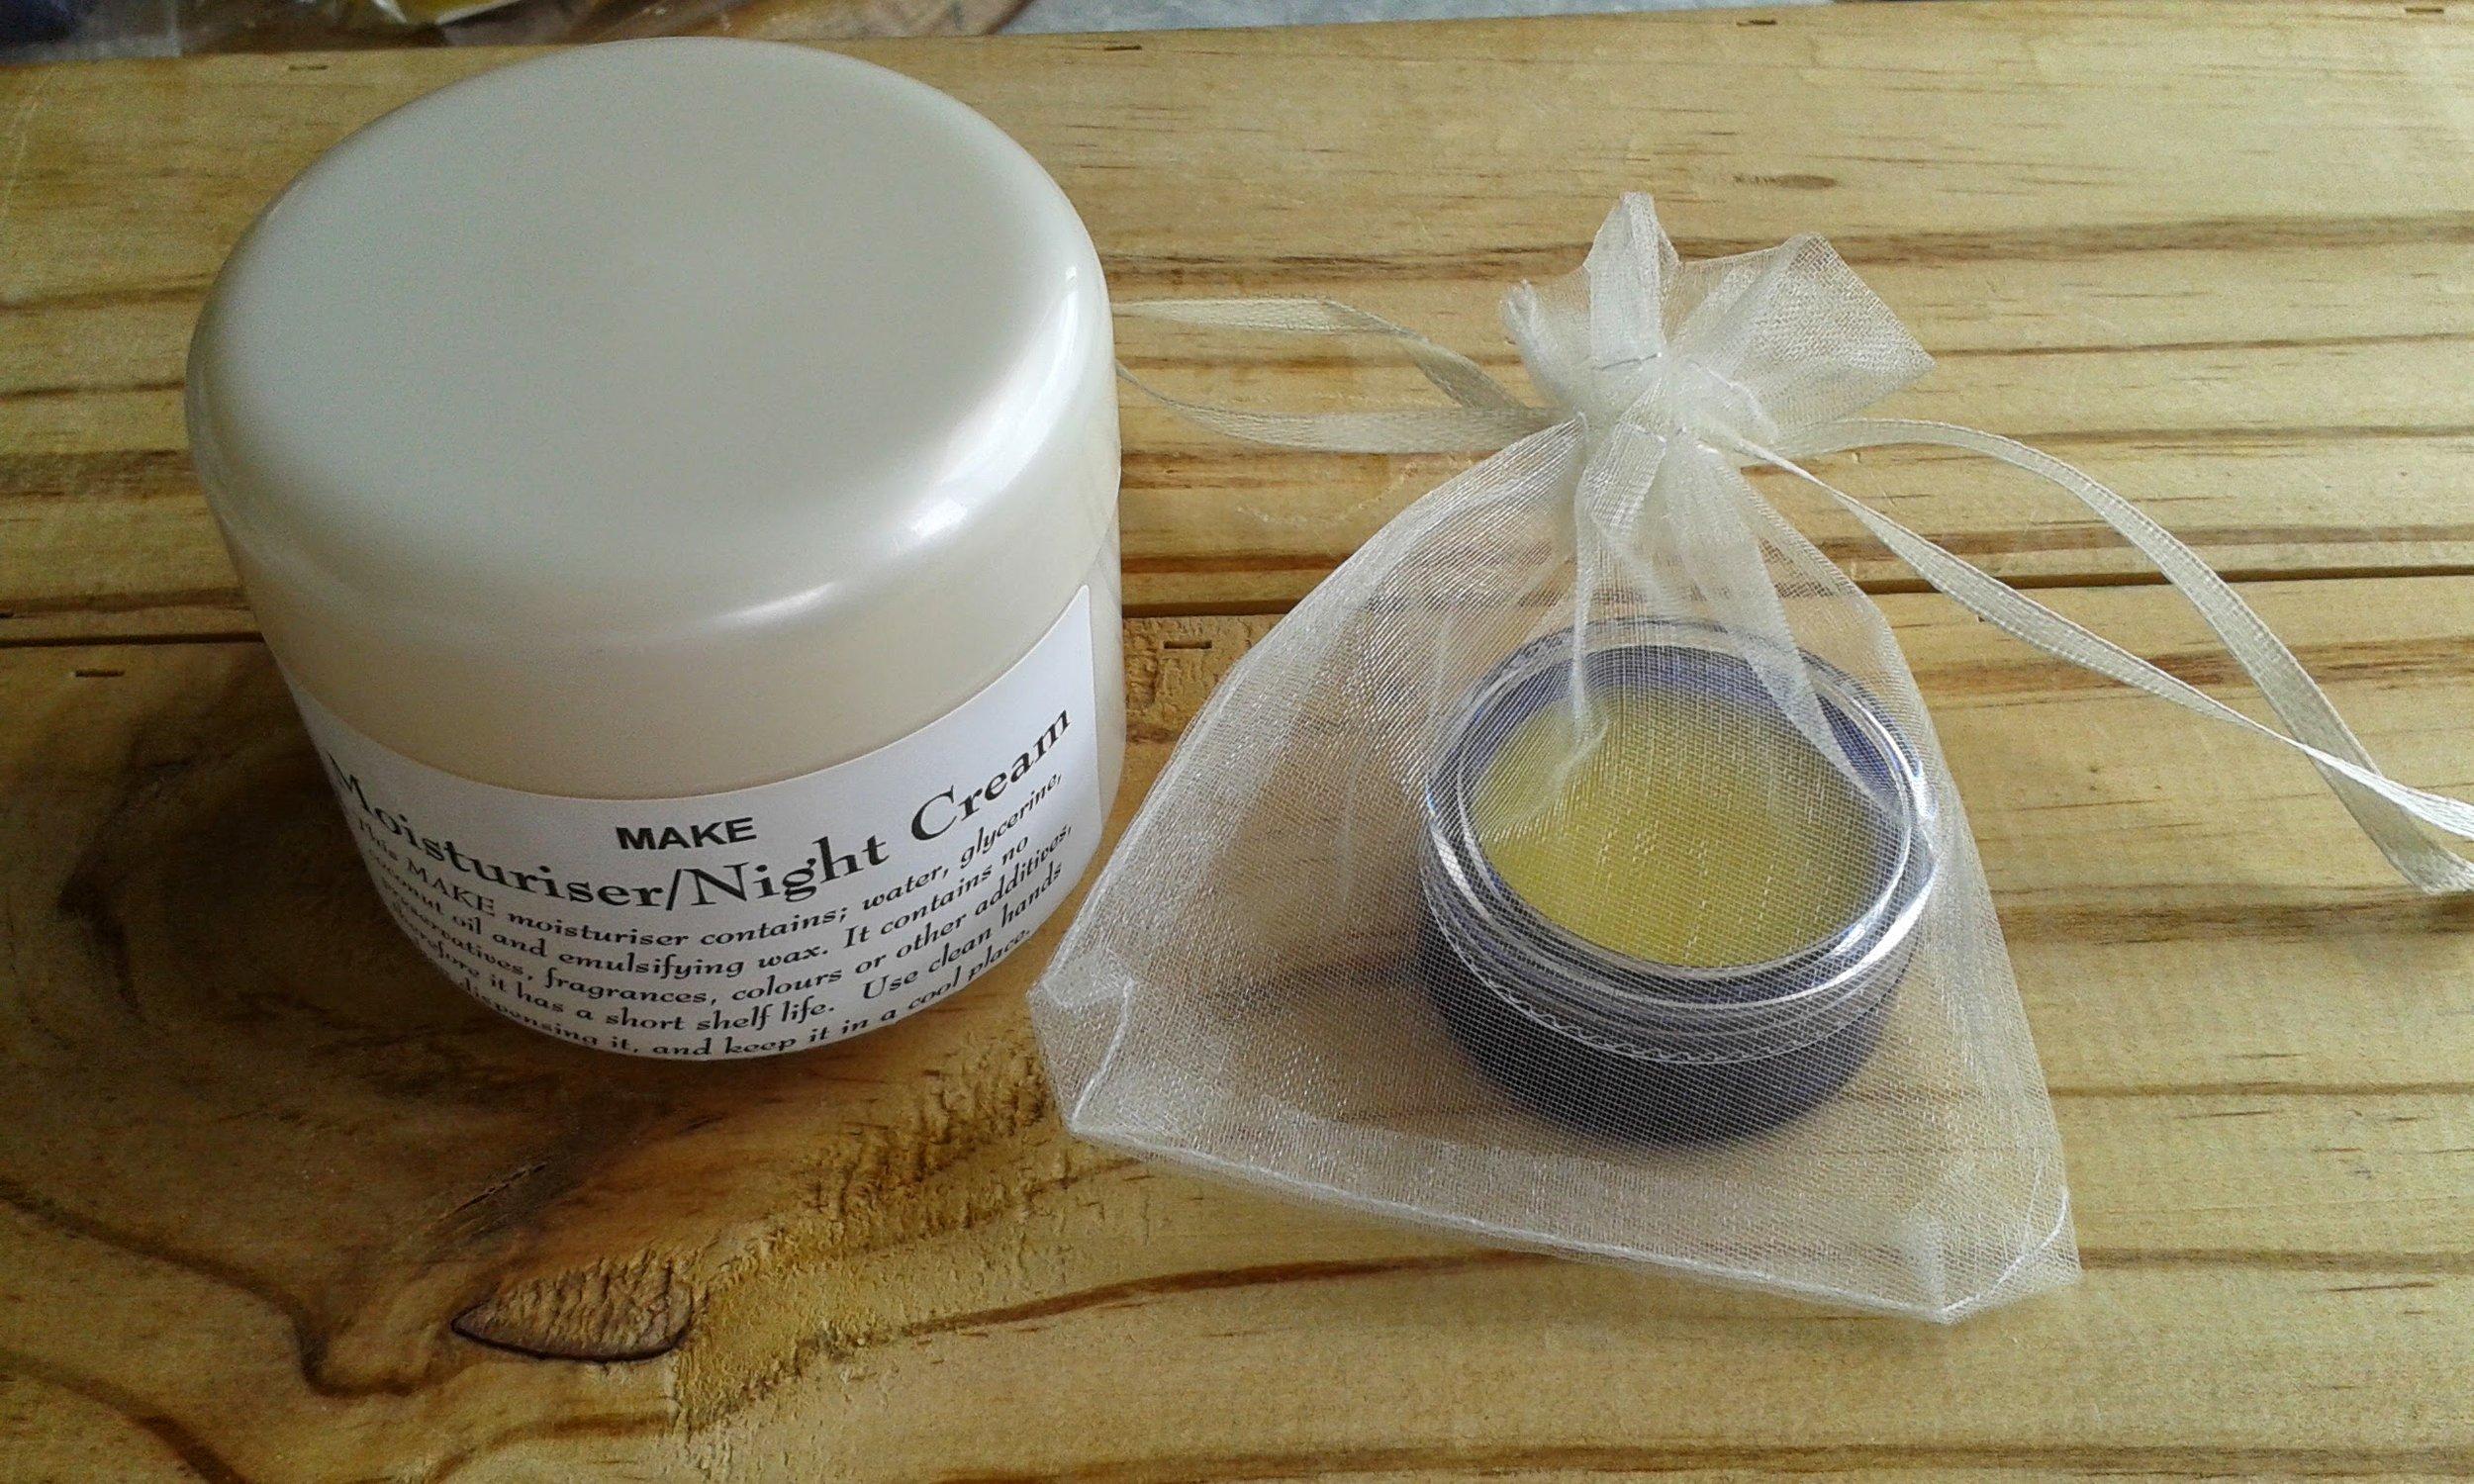 MAKE Moisturiser/Night Cream & MAKE Lip Balm, make great gifts to share with friends &family.